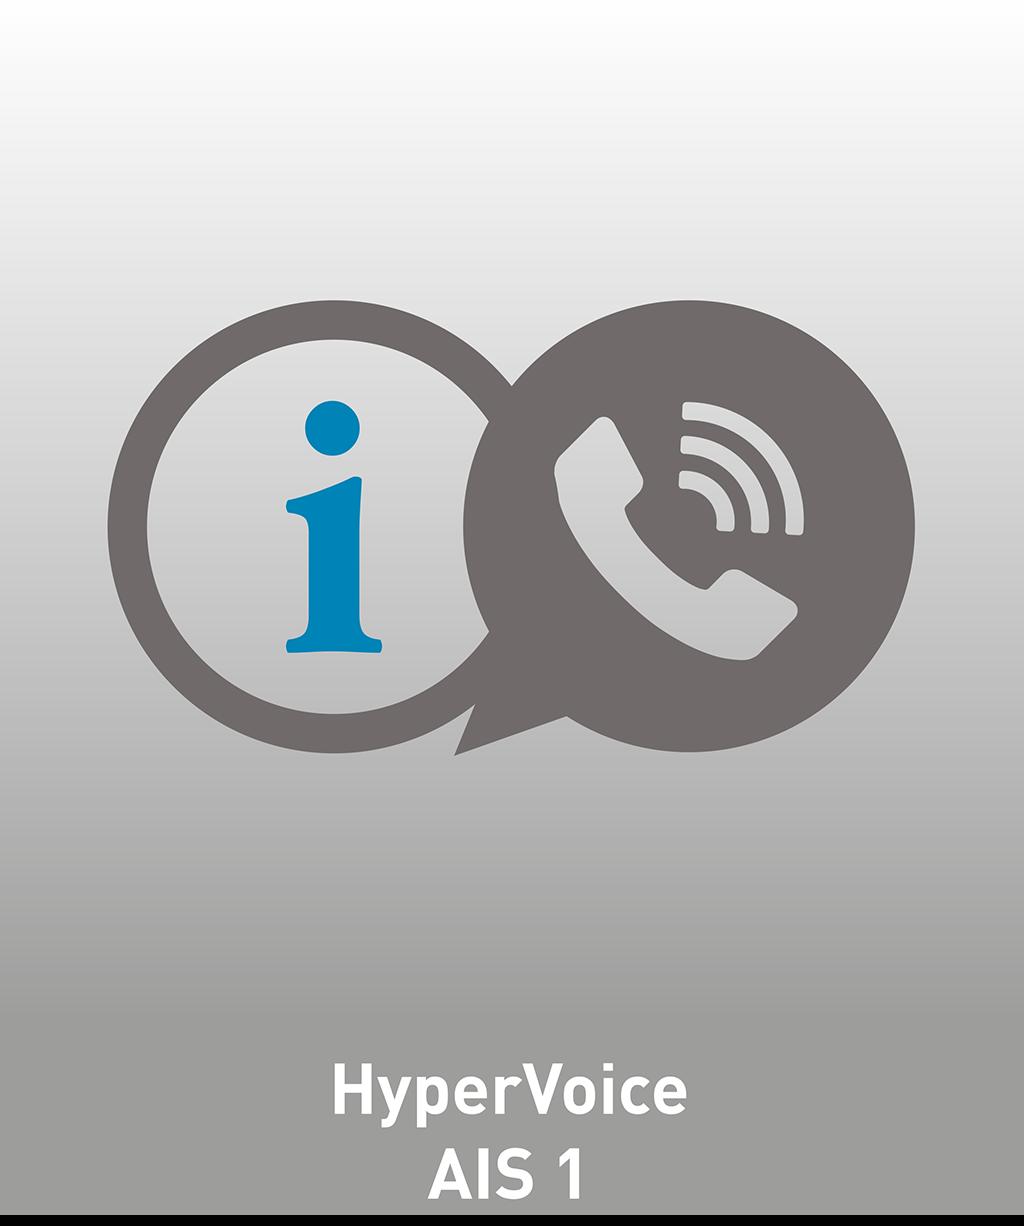 HyperVoice AIS 1 Lizenz